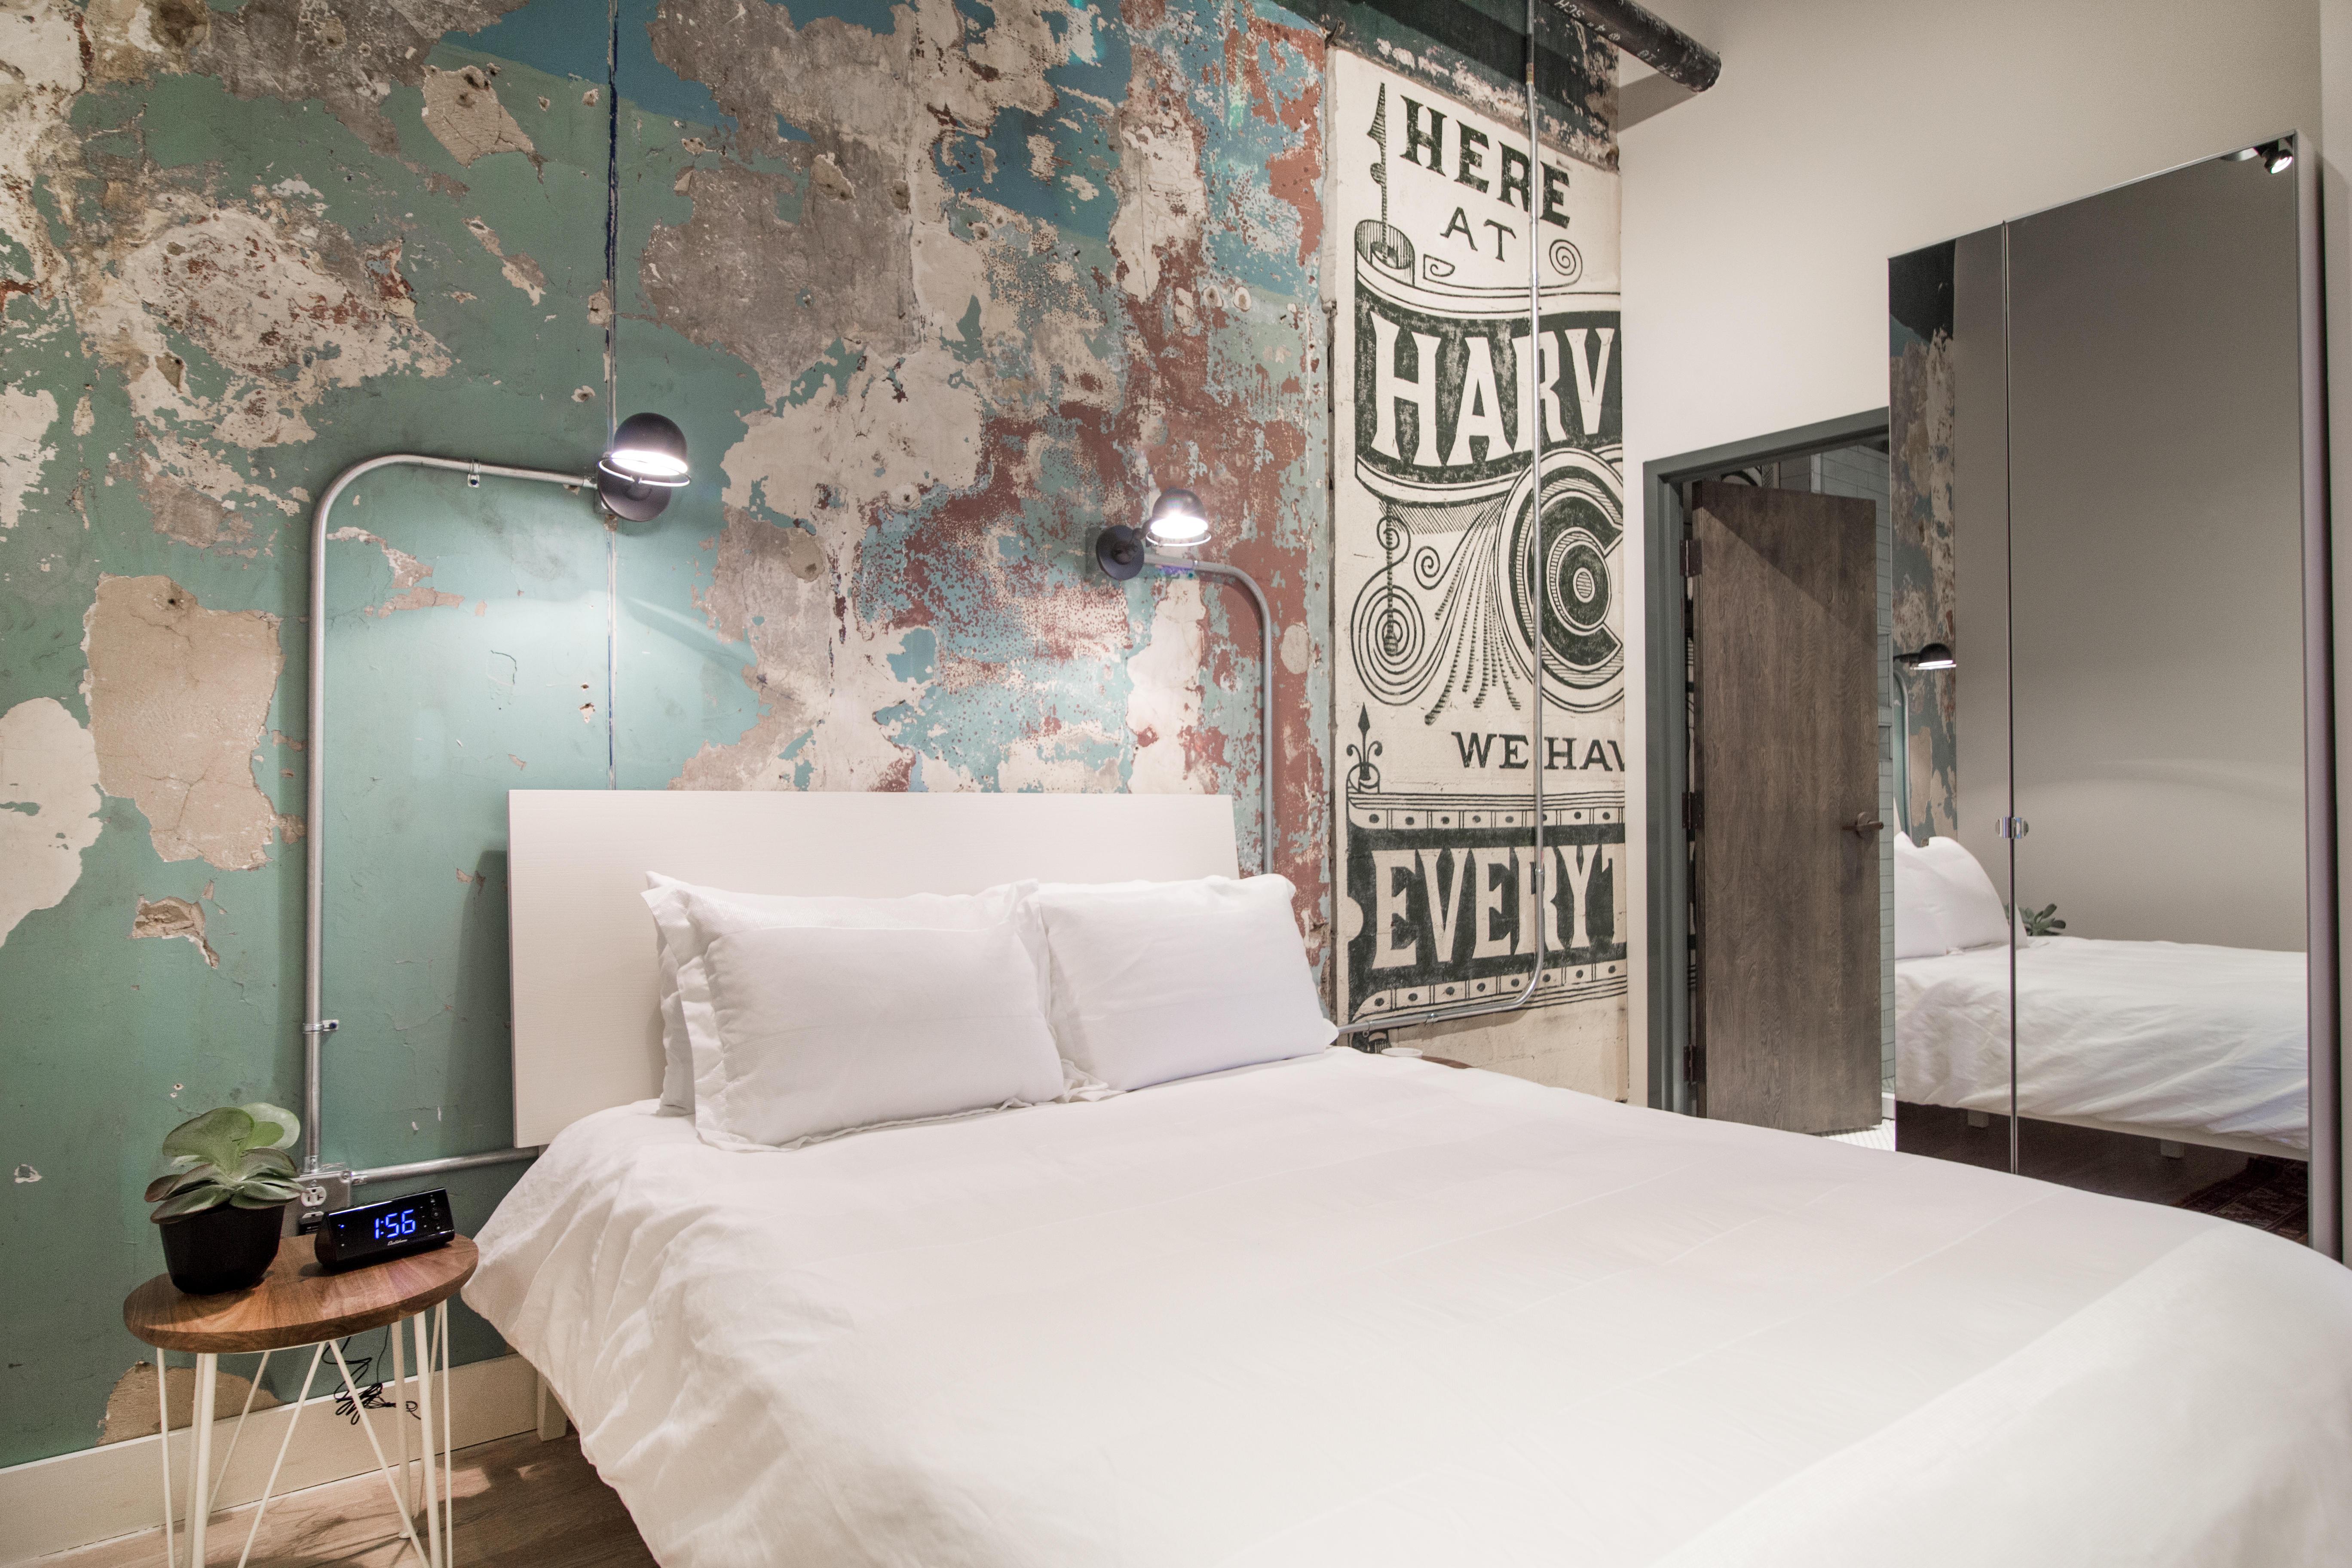 506 Lofts- Nashville Vacation Rentals image 2